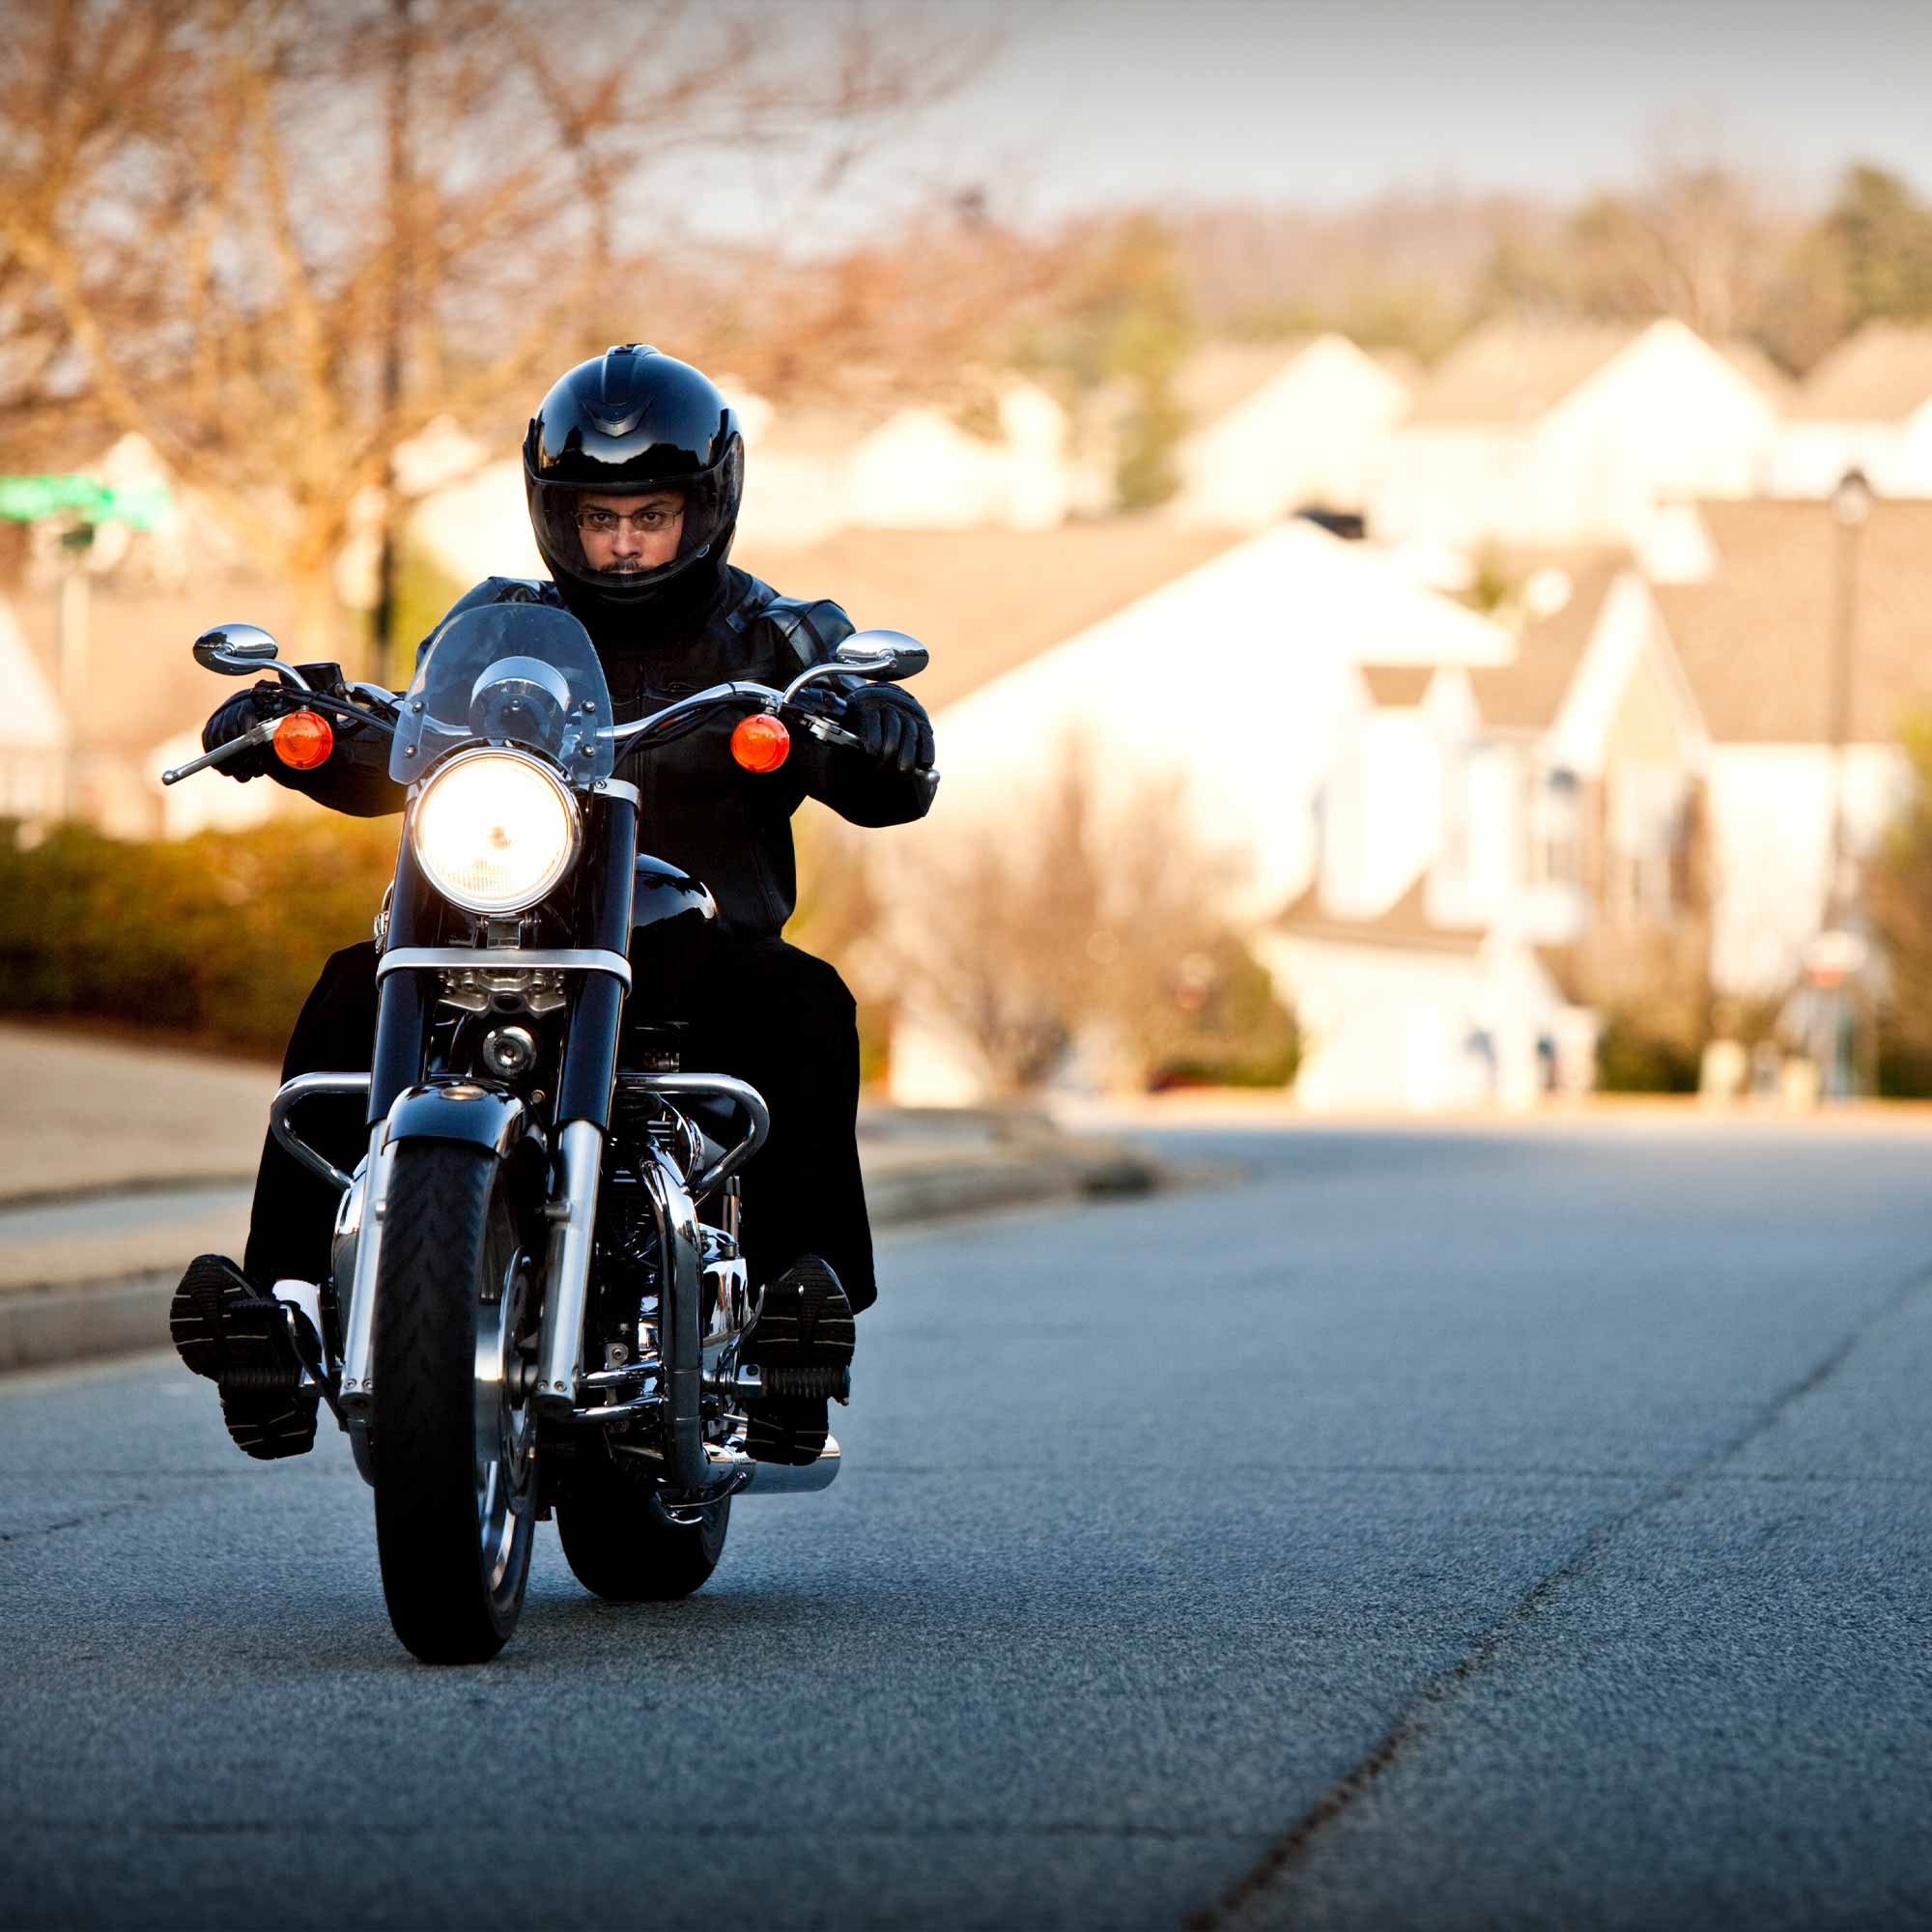 man_on_motorcycle